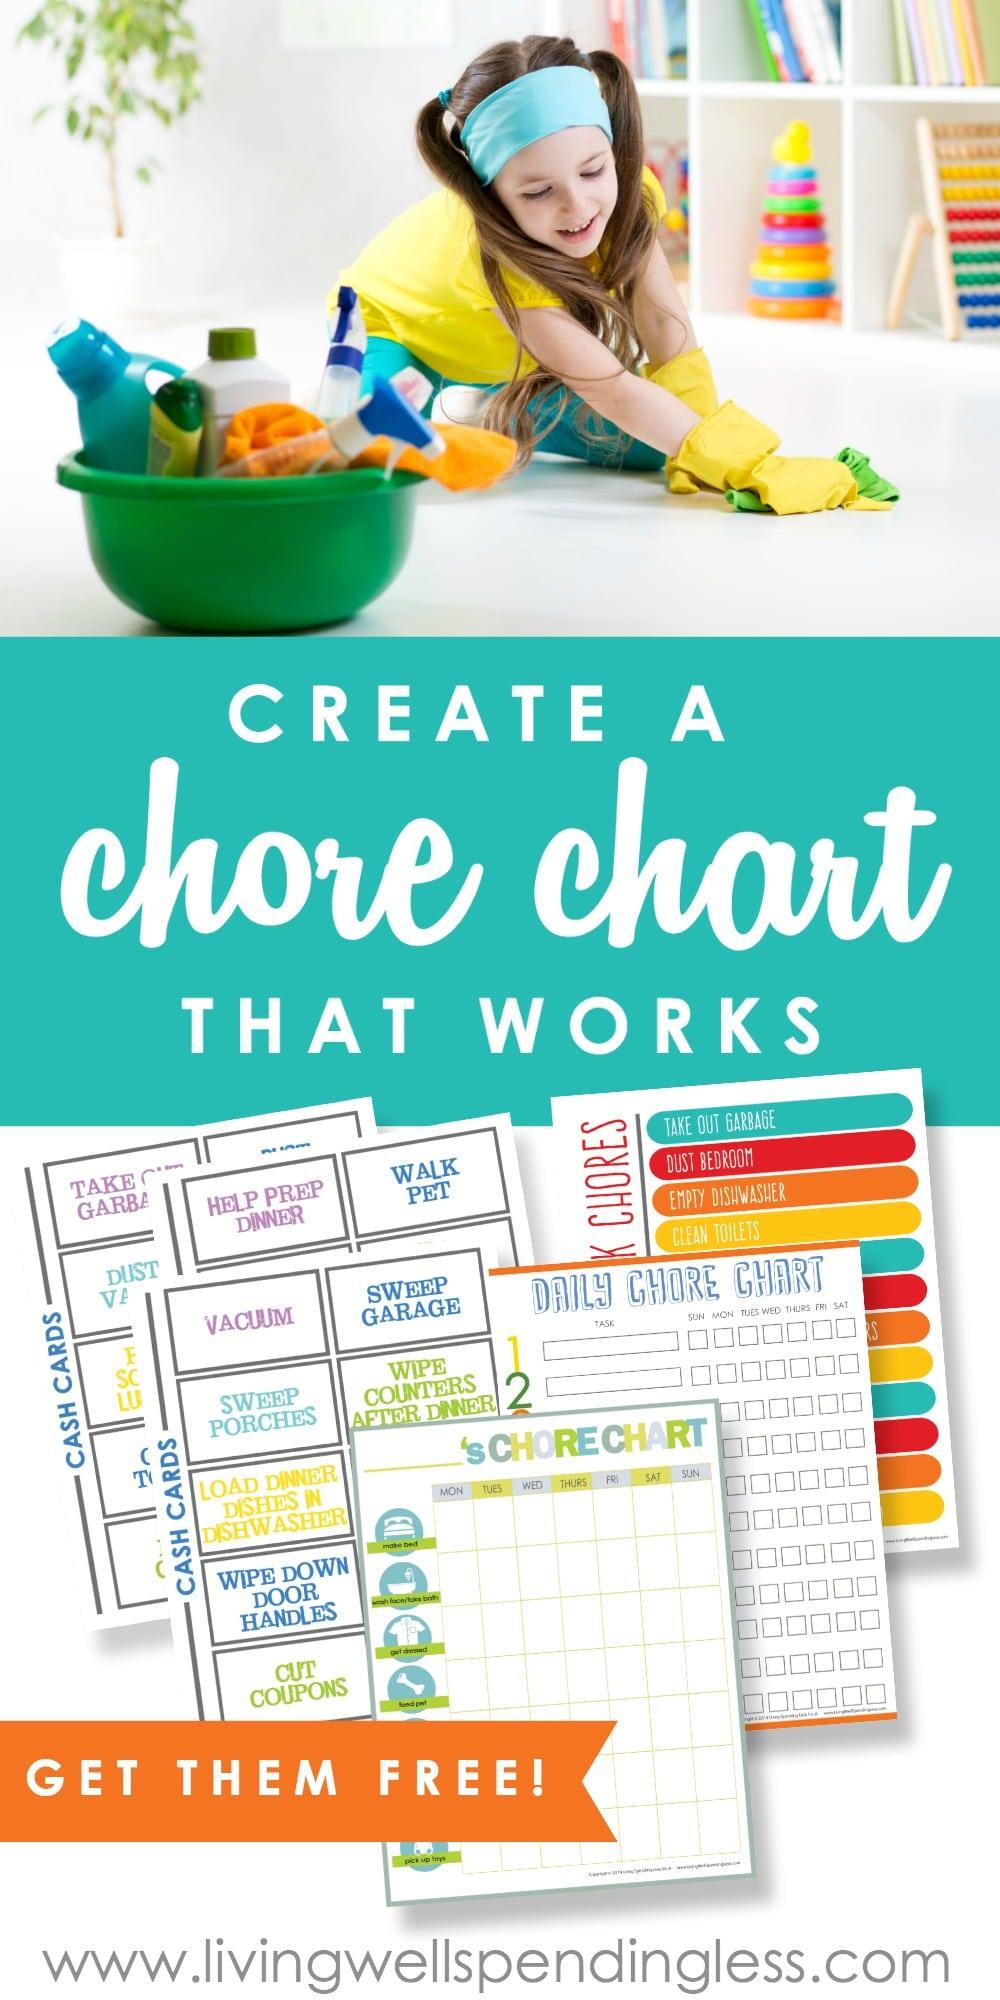 Diy Chore Chart Poster Board